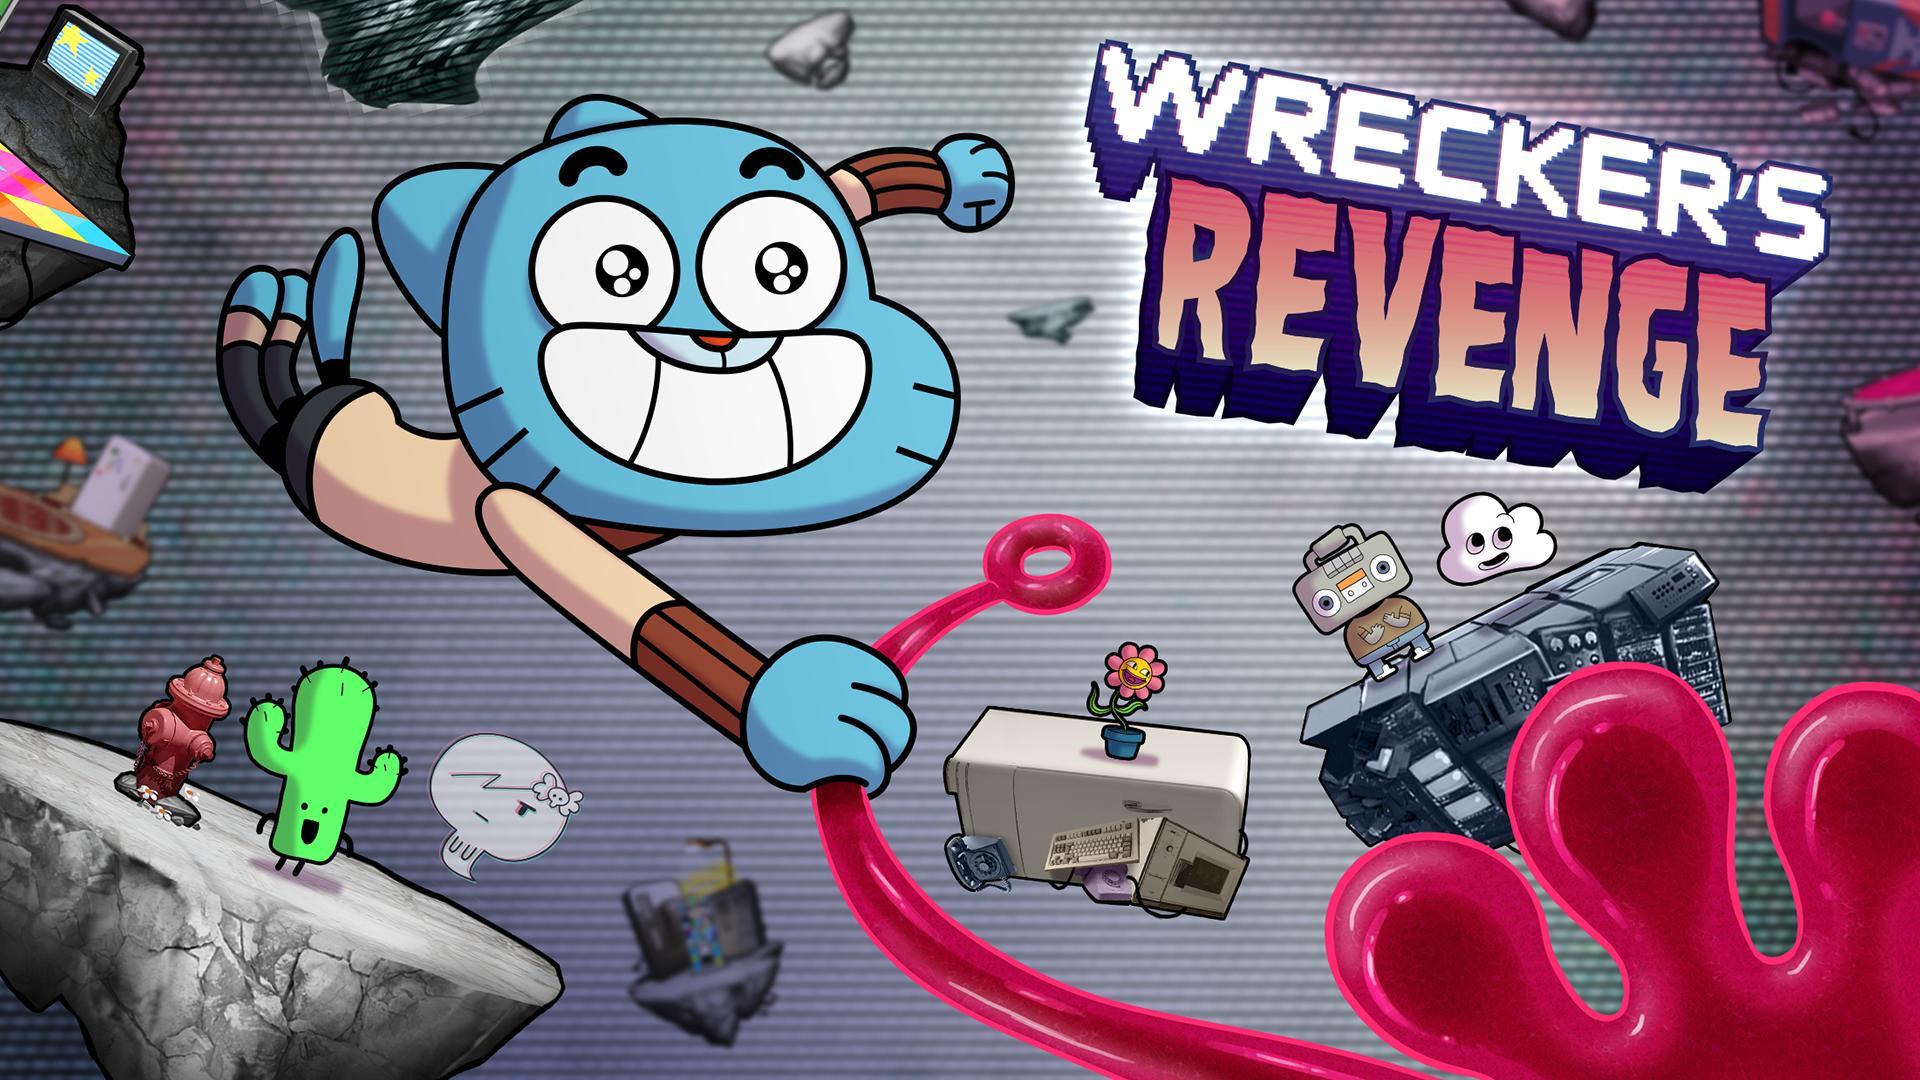 Wrecker's Revenge - Juegos de Gumball for Android - APK Download